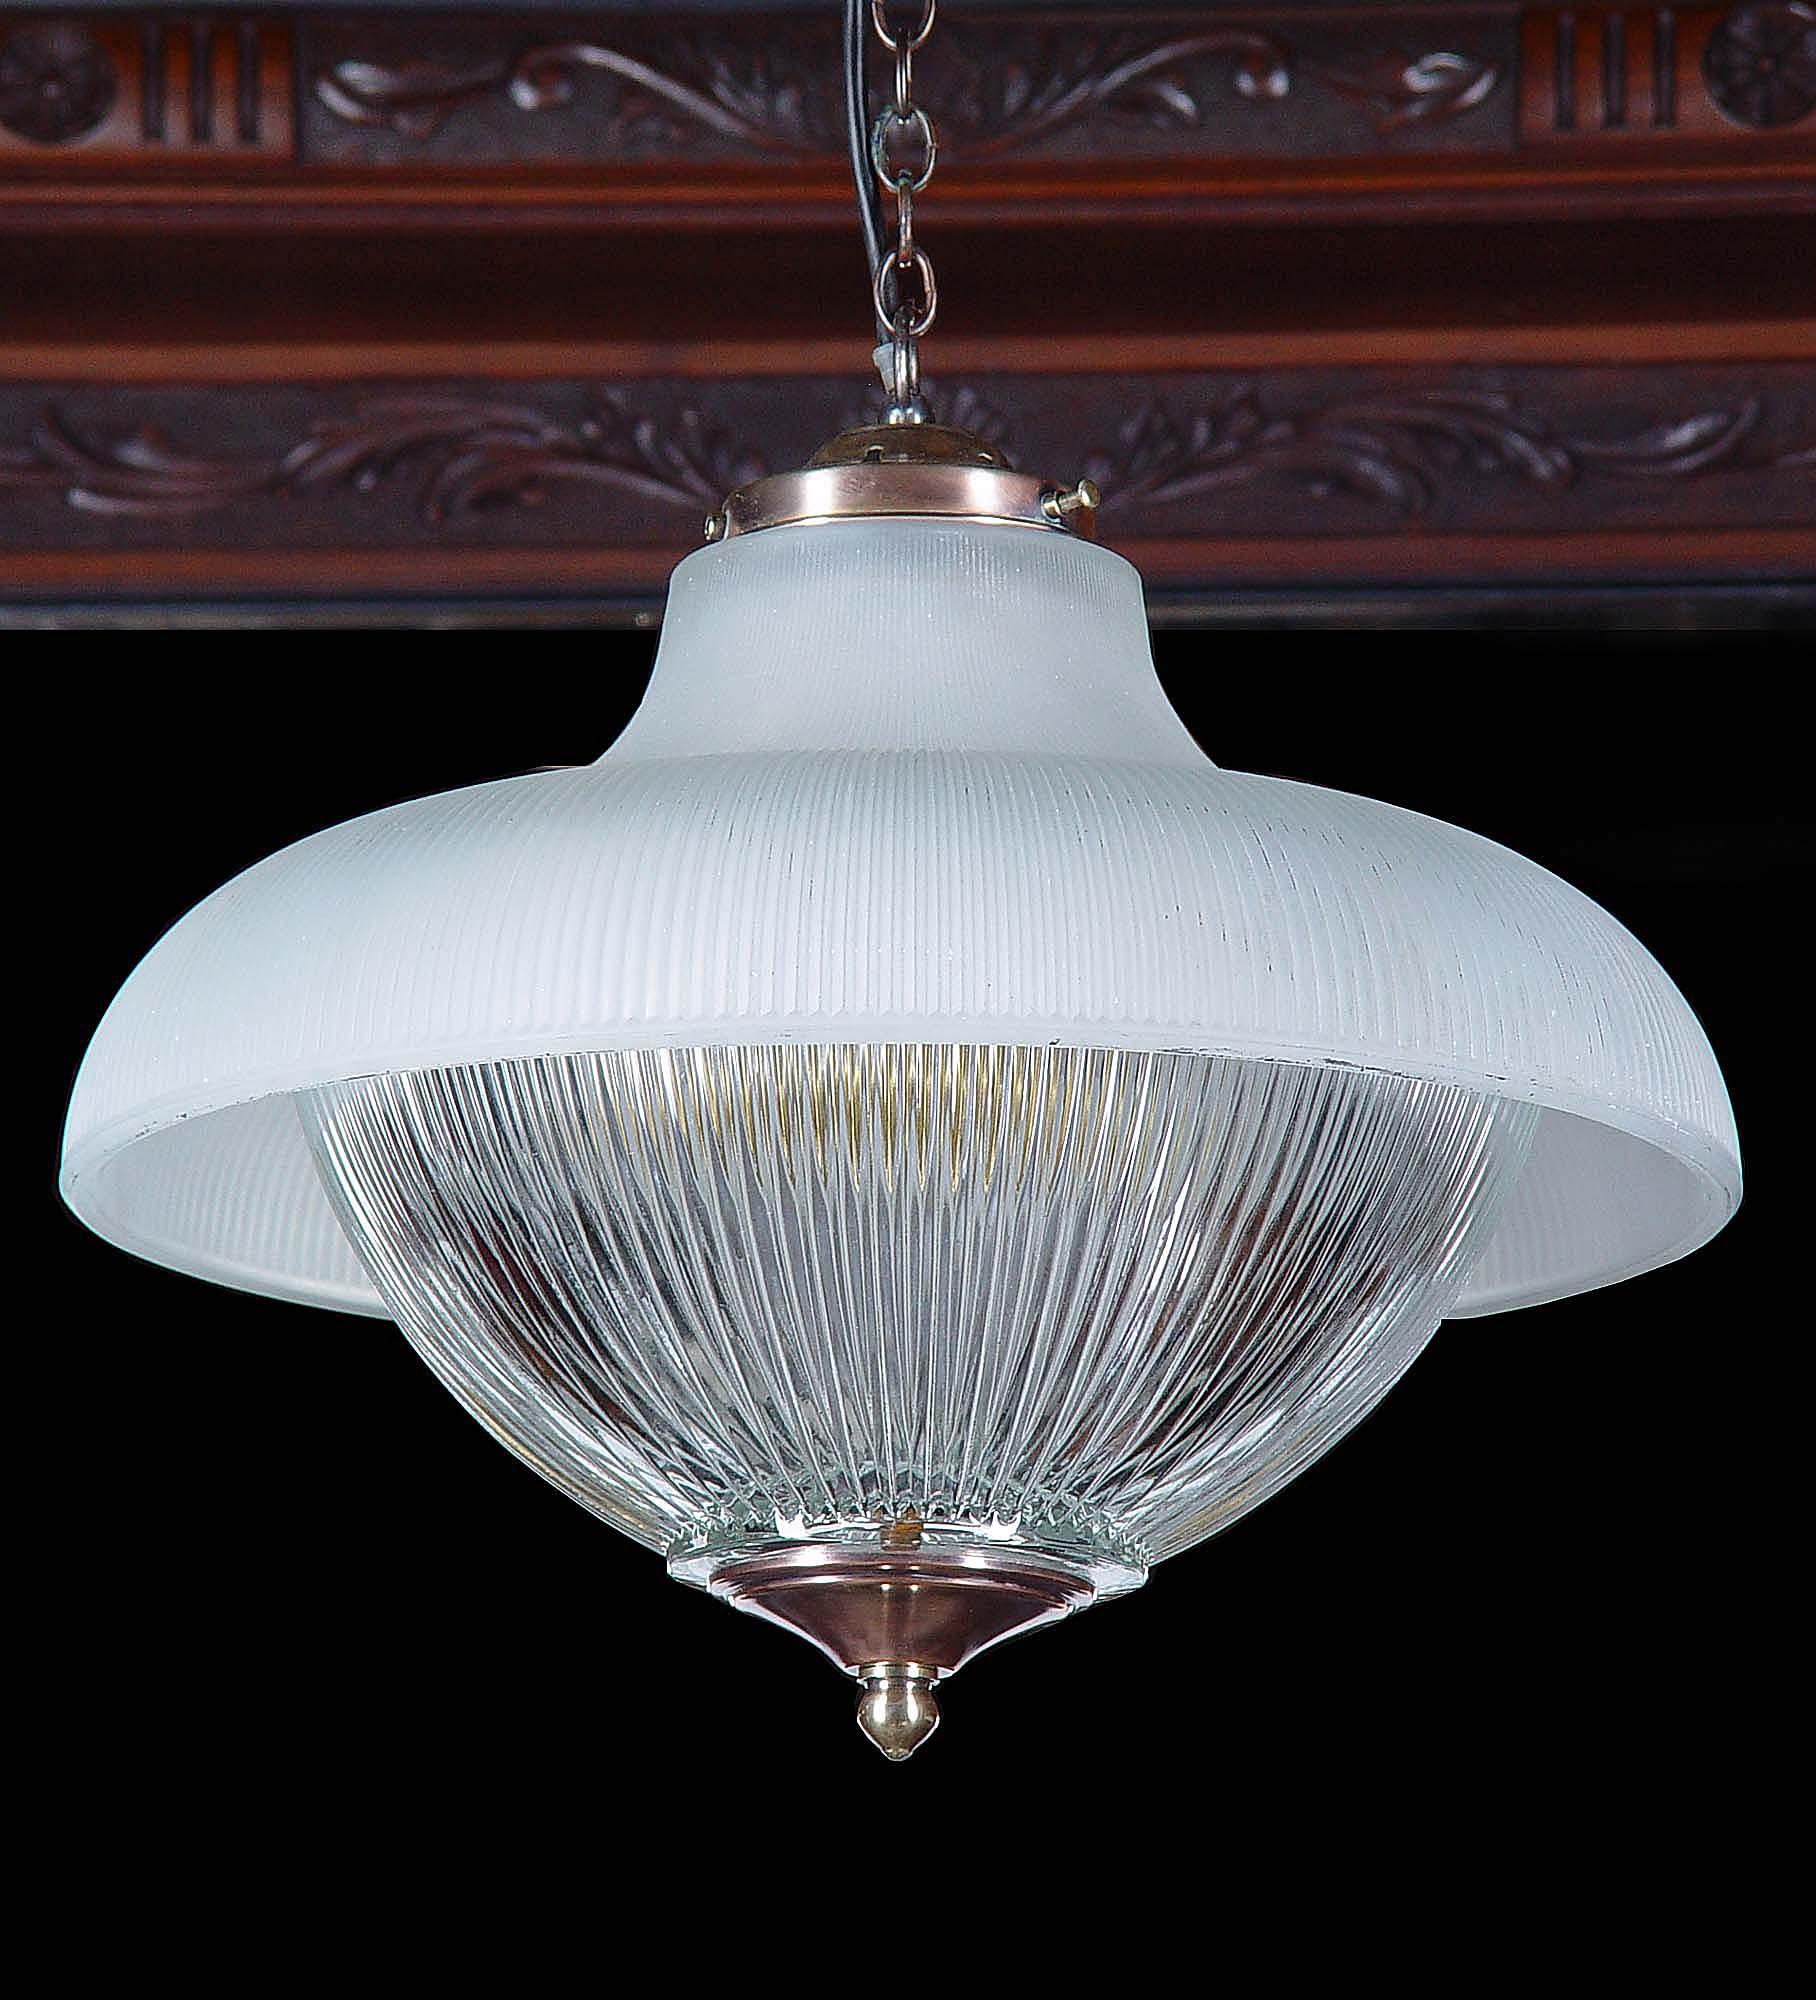 light fixture wiring diagram uk whirlpool oven a ceiling integralbook